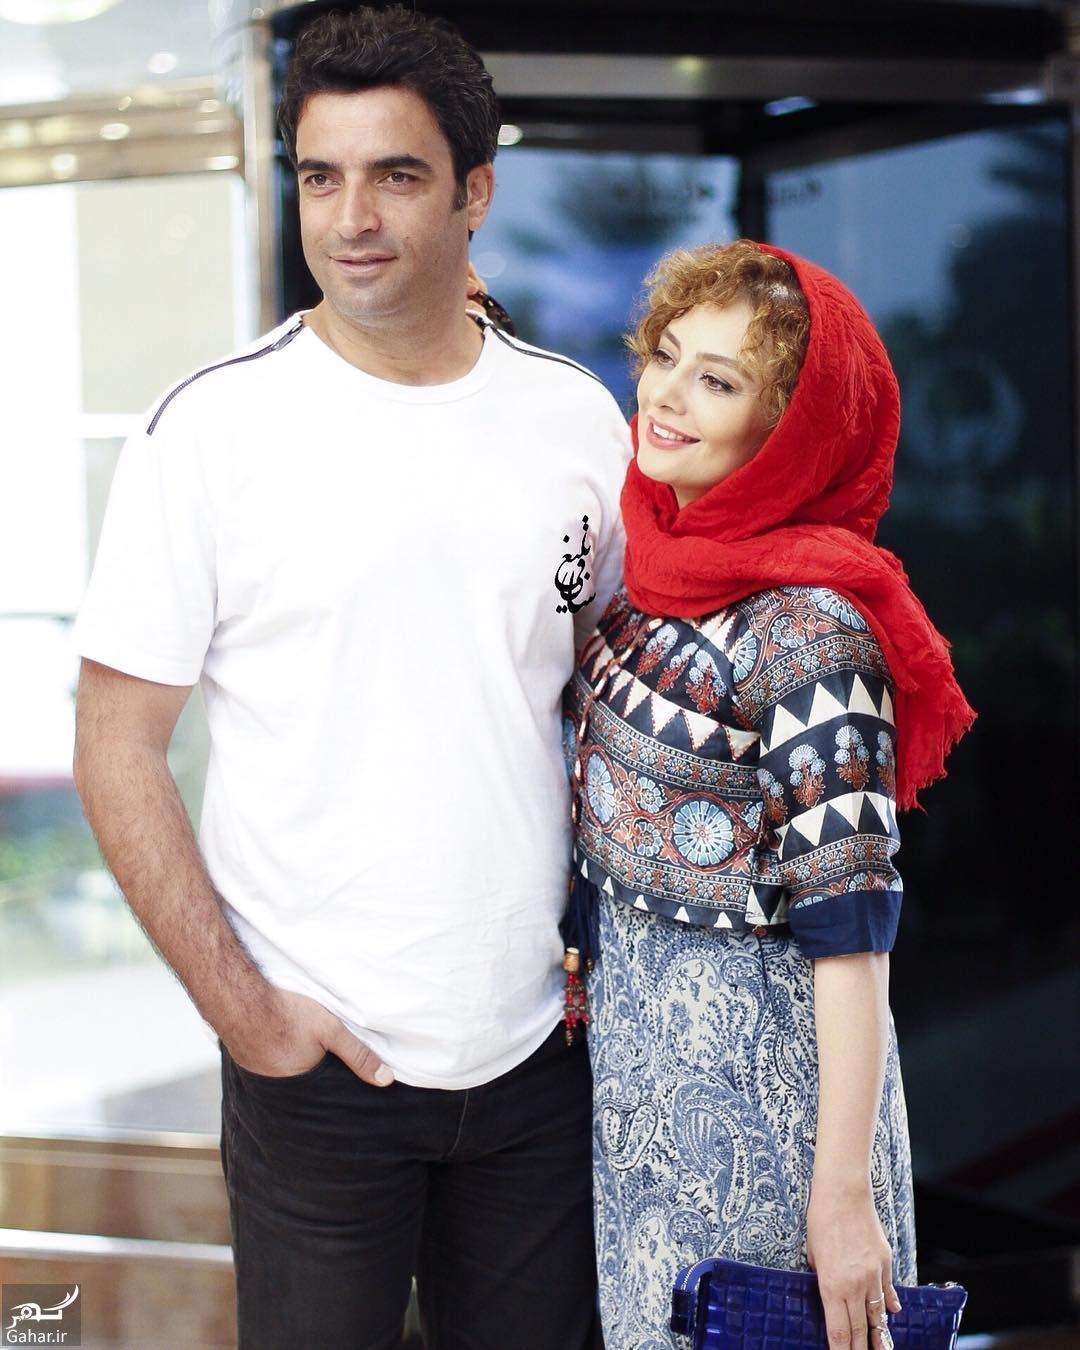 216393 Gahar ir عکس/ ژست های عاشقانه یکتا ناصر و همسرش در مراسم رونمایی از پوستر آینه بغل